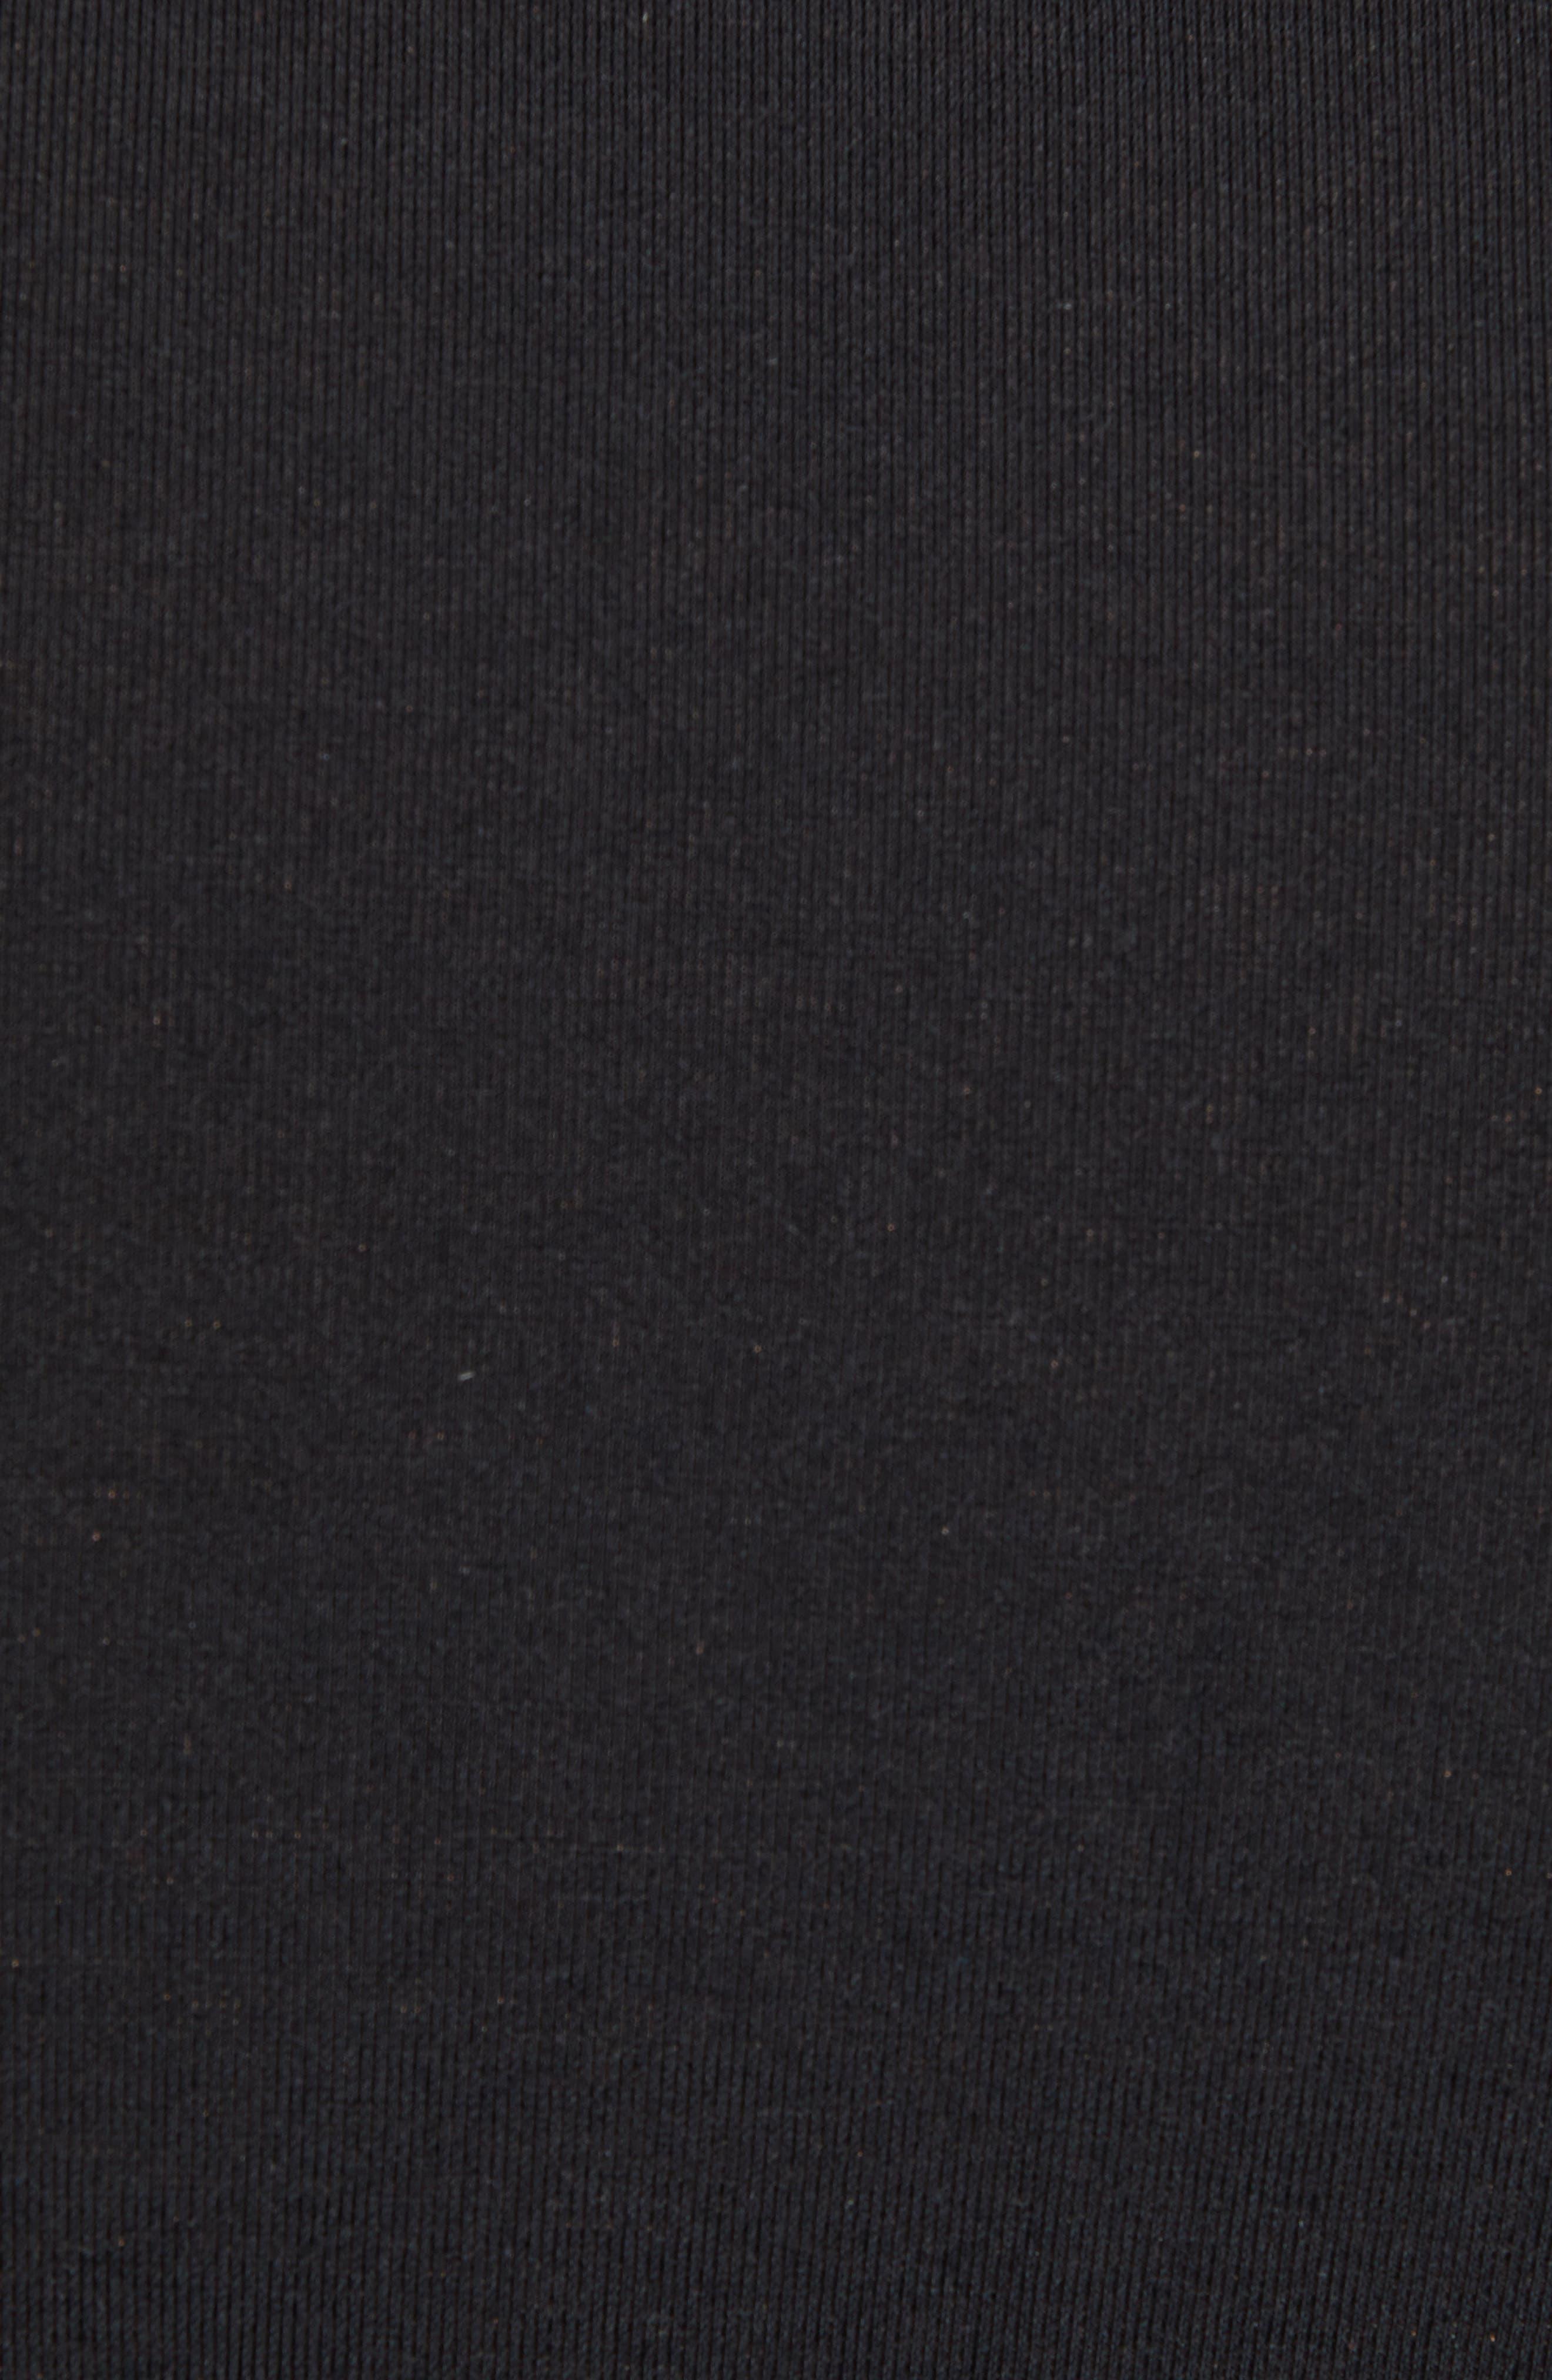 CALVIN KLEIN, Ultrasoft Stretch Modal Blend Crewneck T-Shirt, Alternate thumbnail 5, color, BLACK